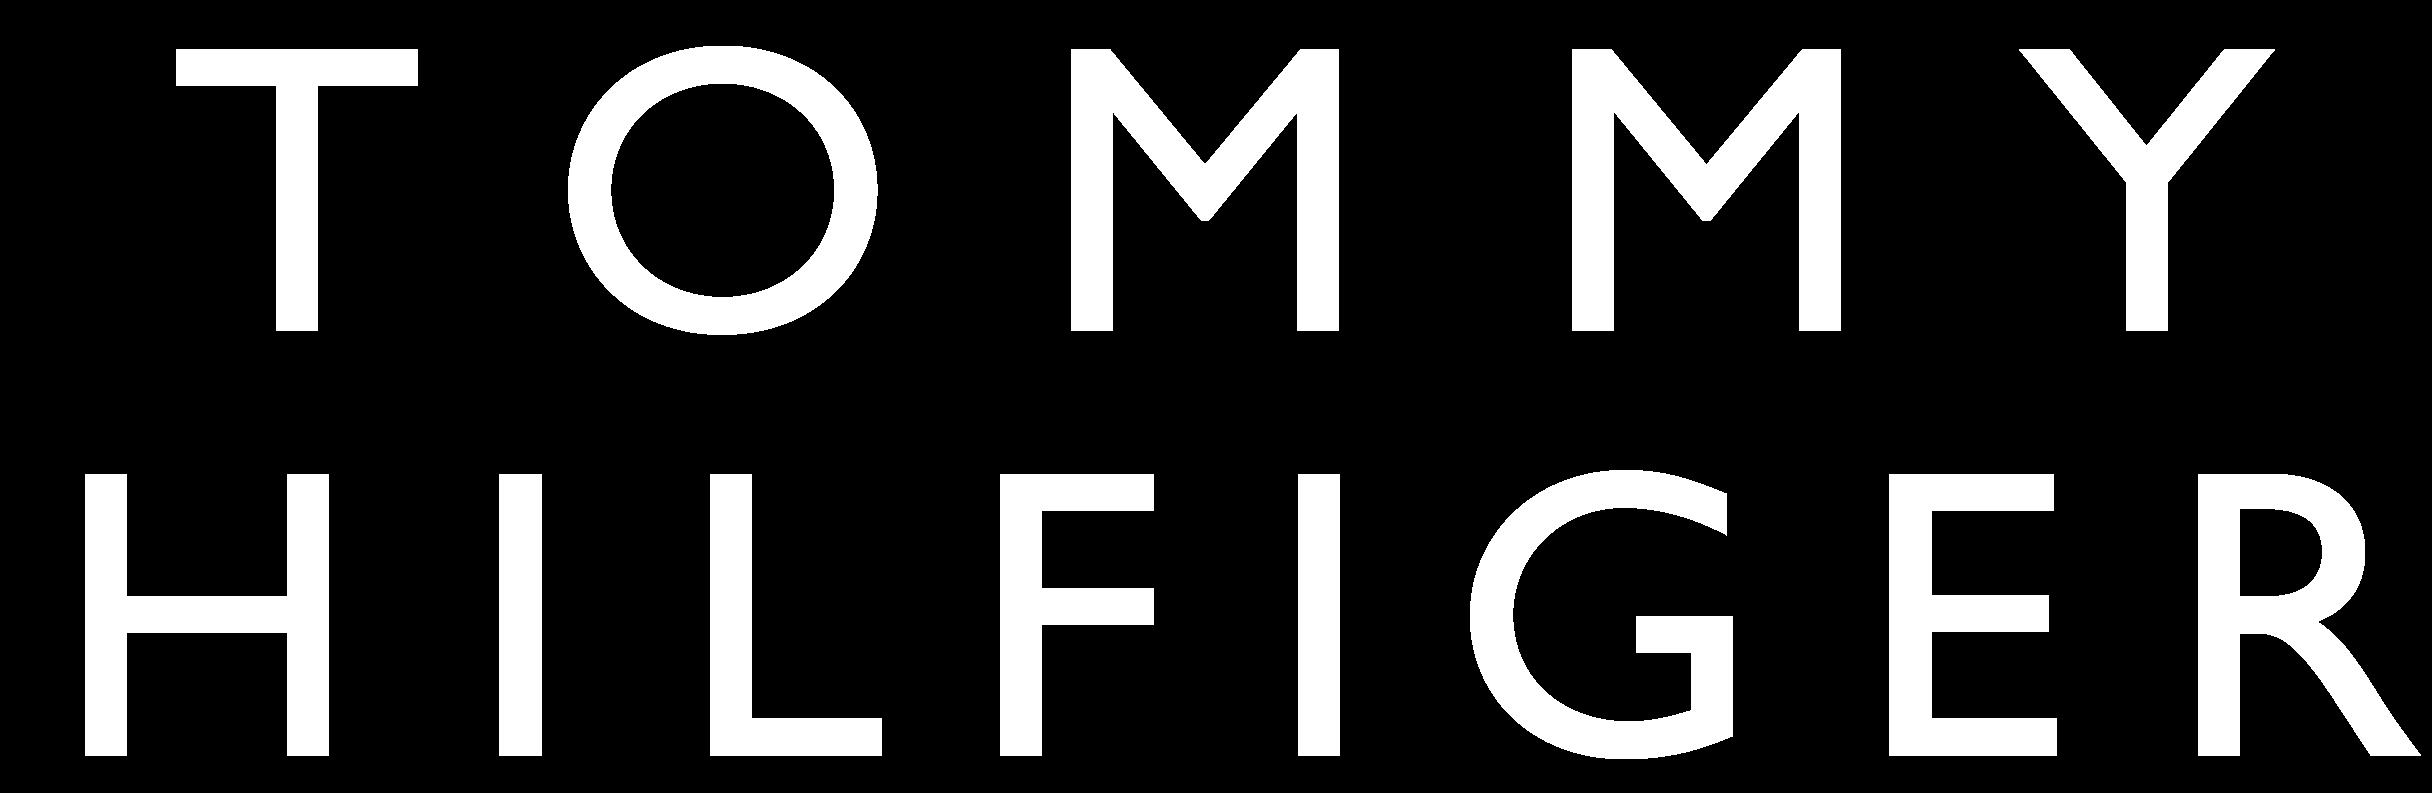 Logo for Hilfiger Club, the loyalty program of Tommy Hilfiger.